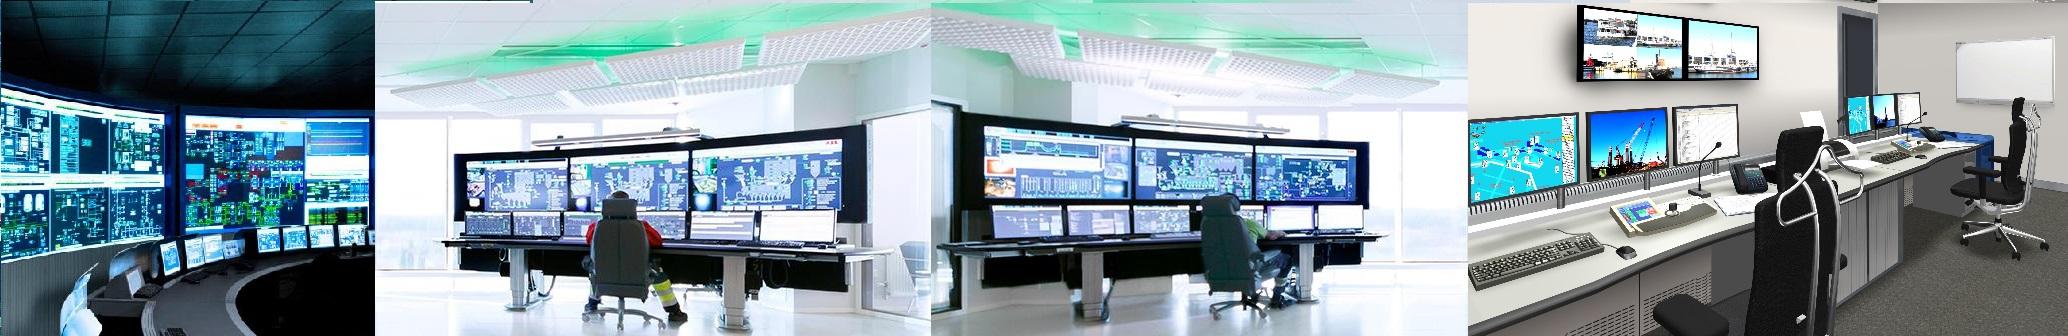 Conmutadores para salas de control, salas CCTV